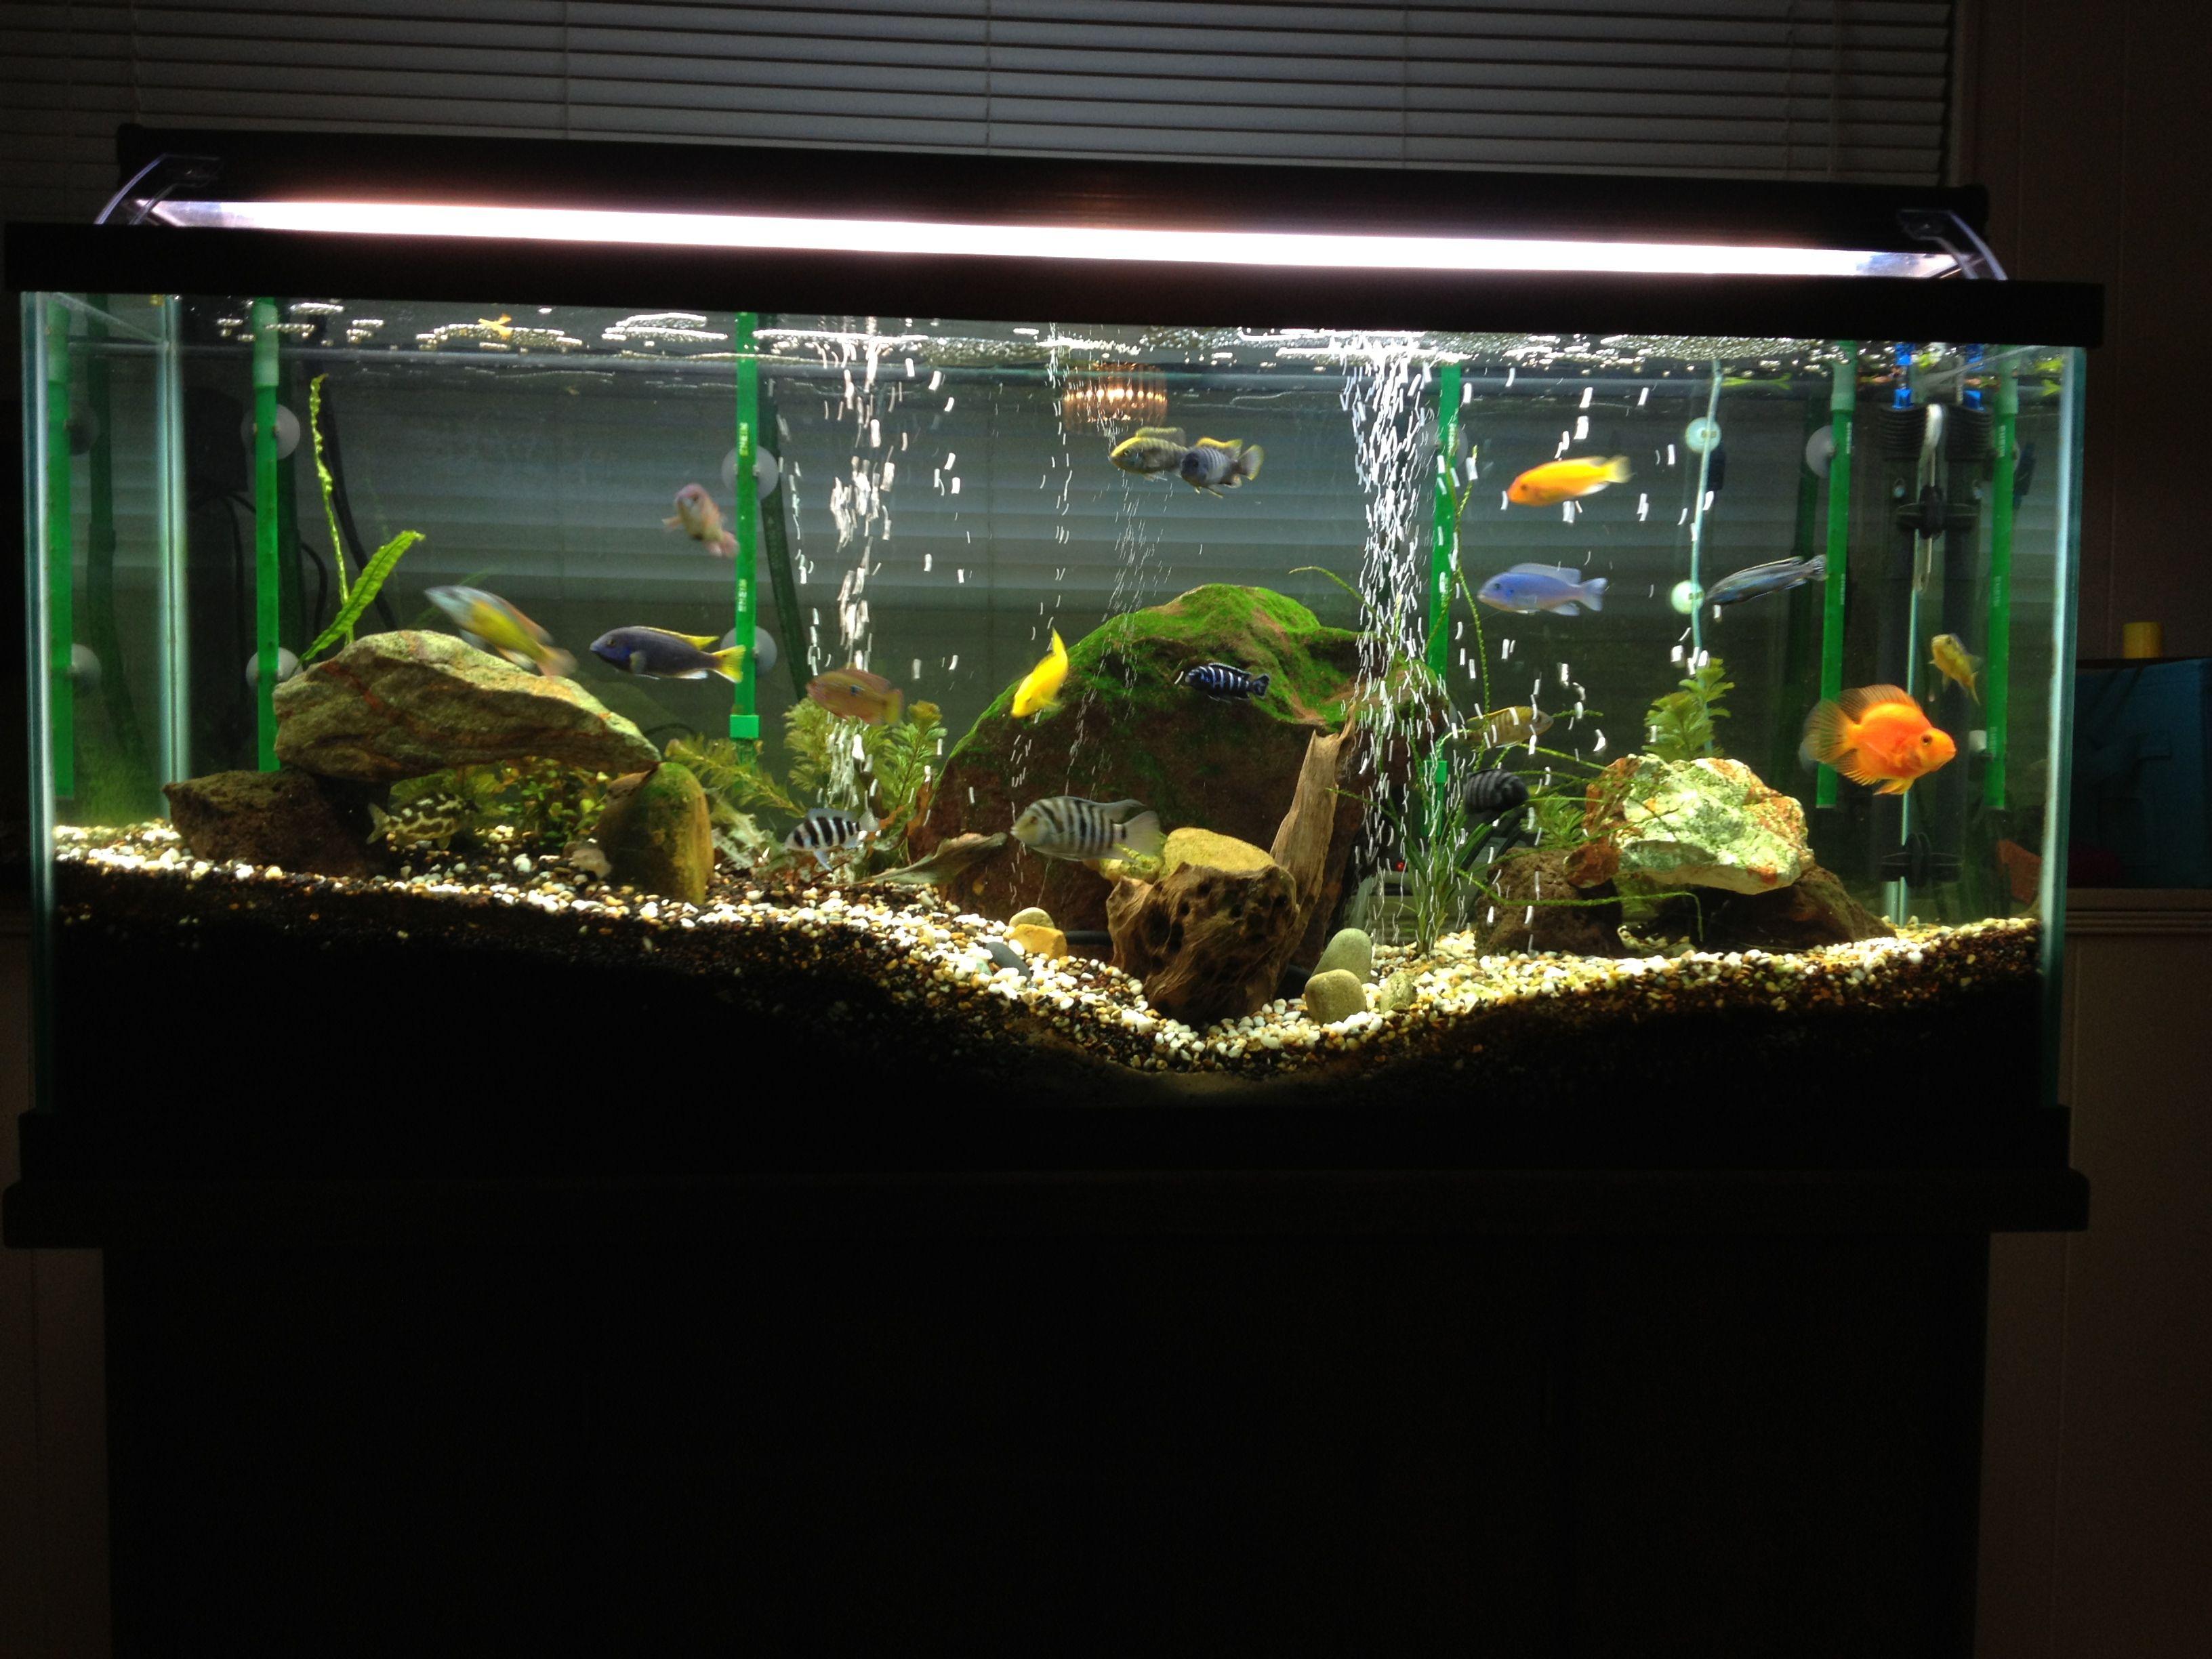 Cichlid Aquarium With Live Plants Planted Aquarium Cichlid Aquarium Aquarium